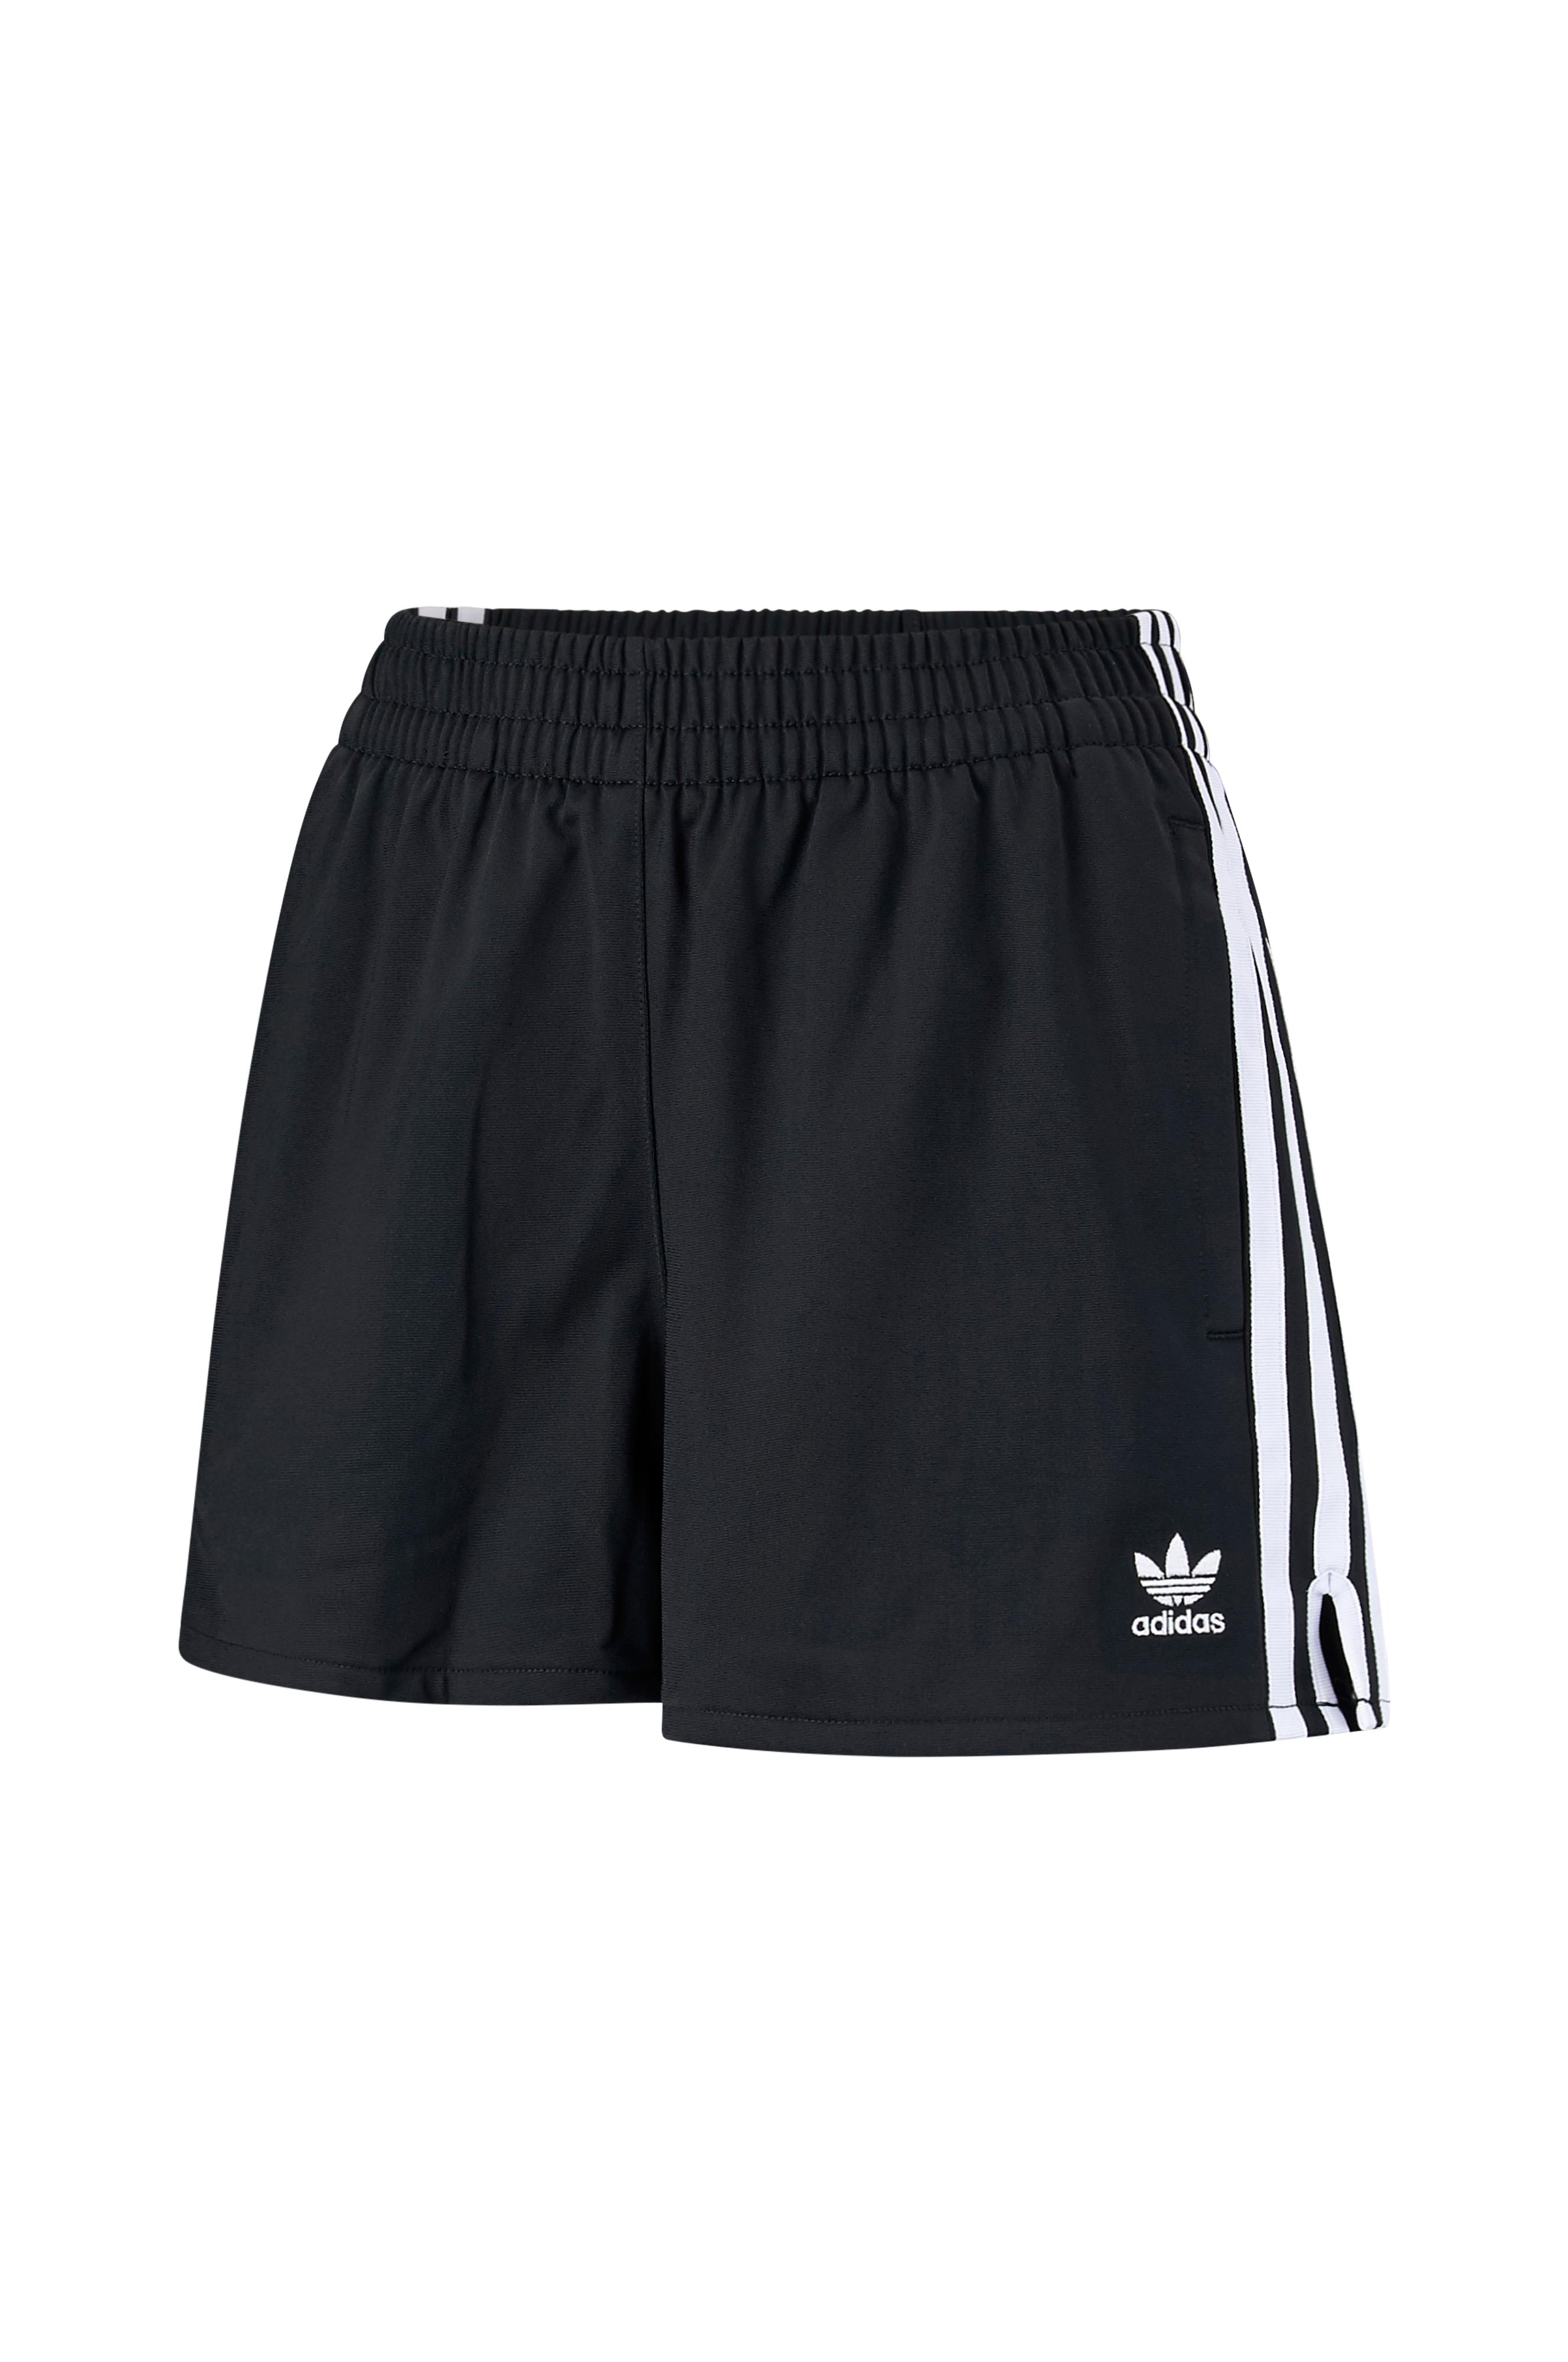 adidas Originals Shorts 3 Str Short Svart Dame Ellos.no